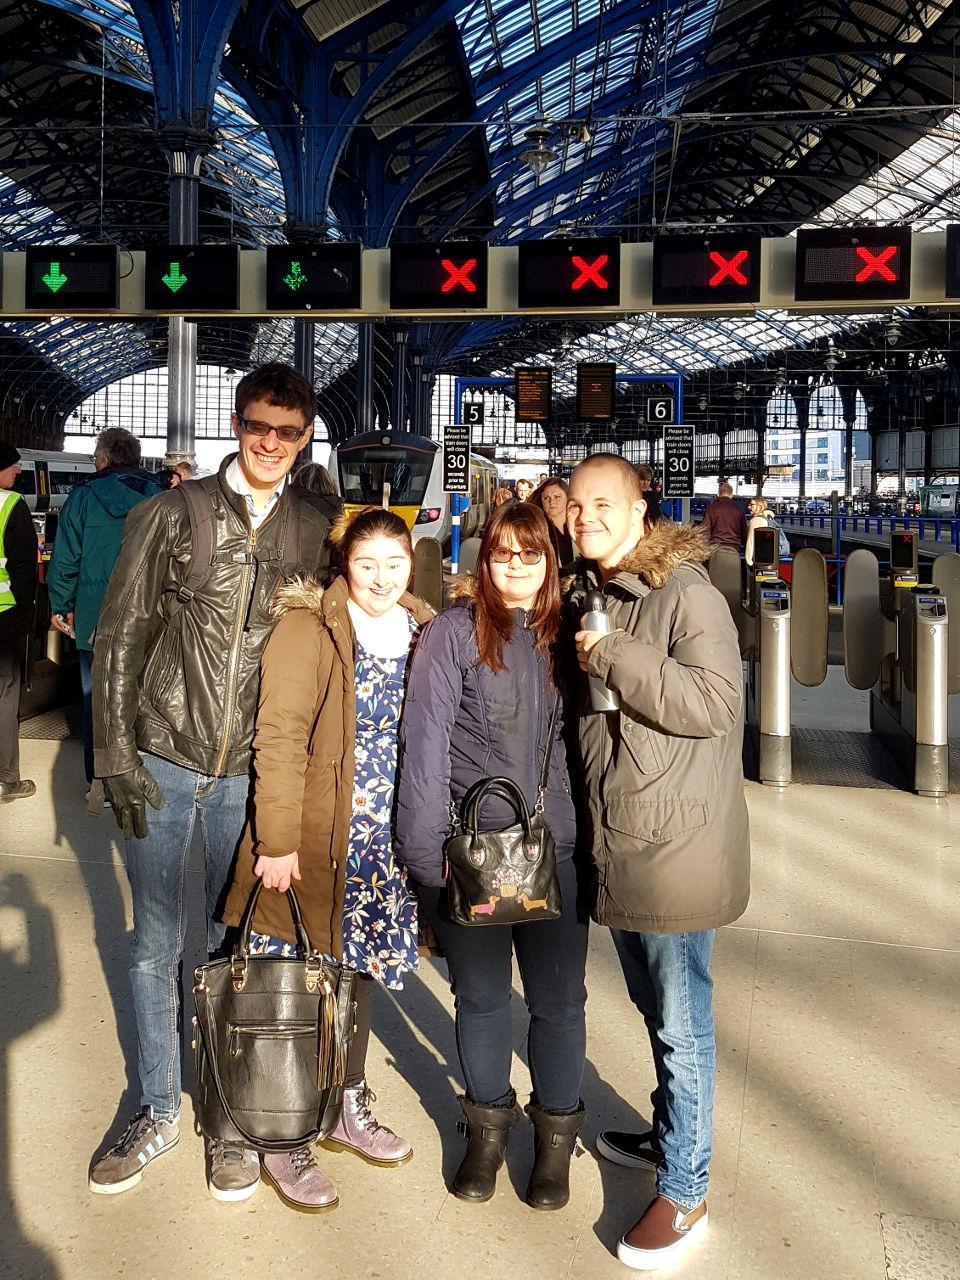 Lewis, Hilly, Megan & Sam at Brighton Railway Station.